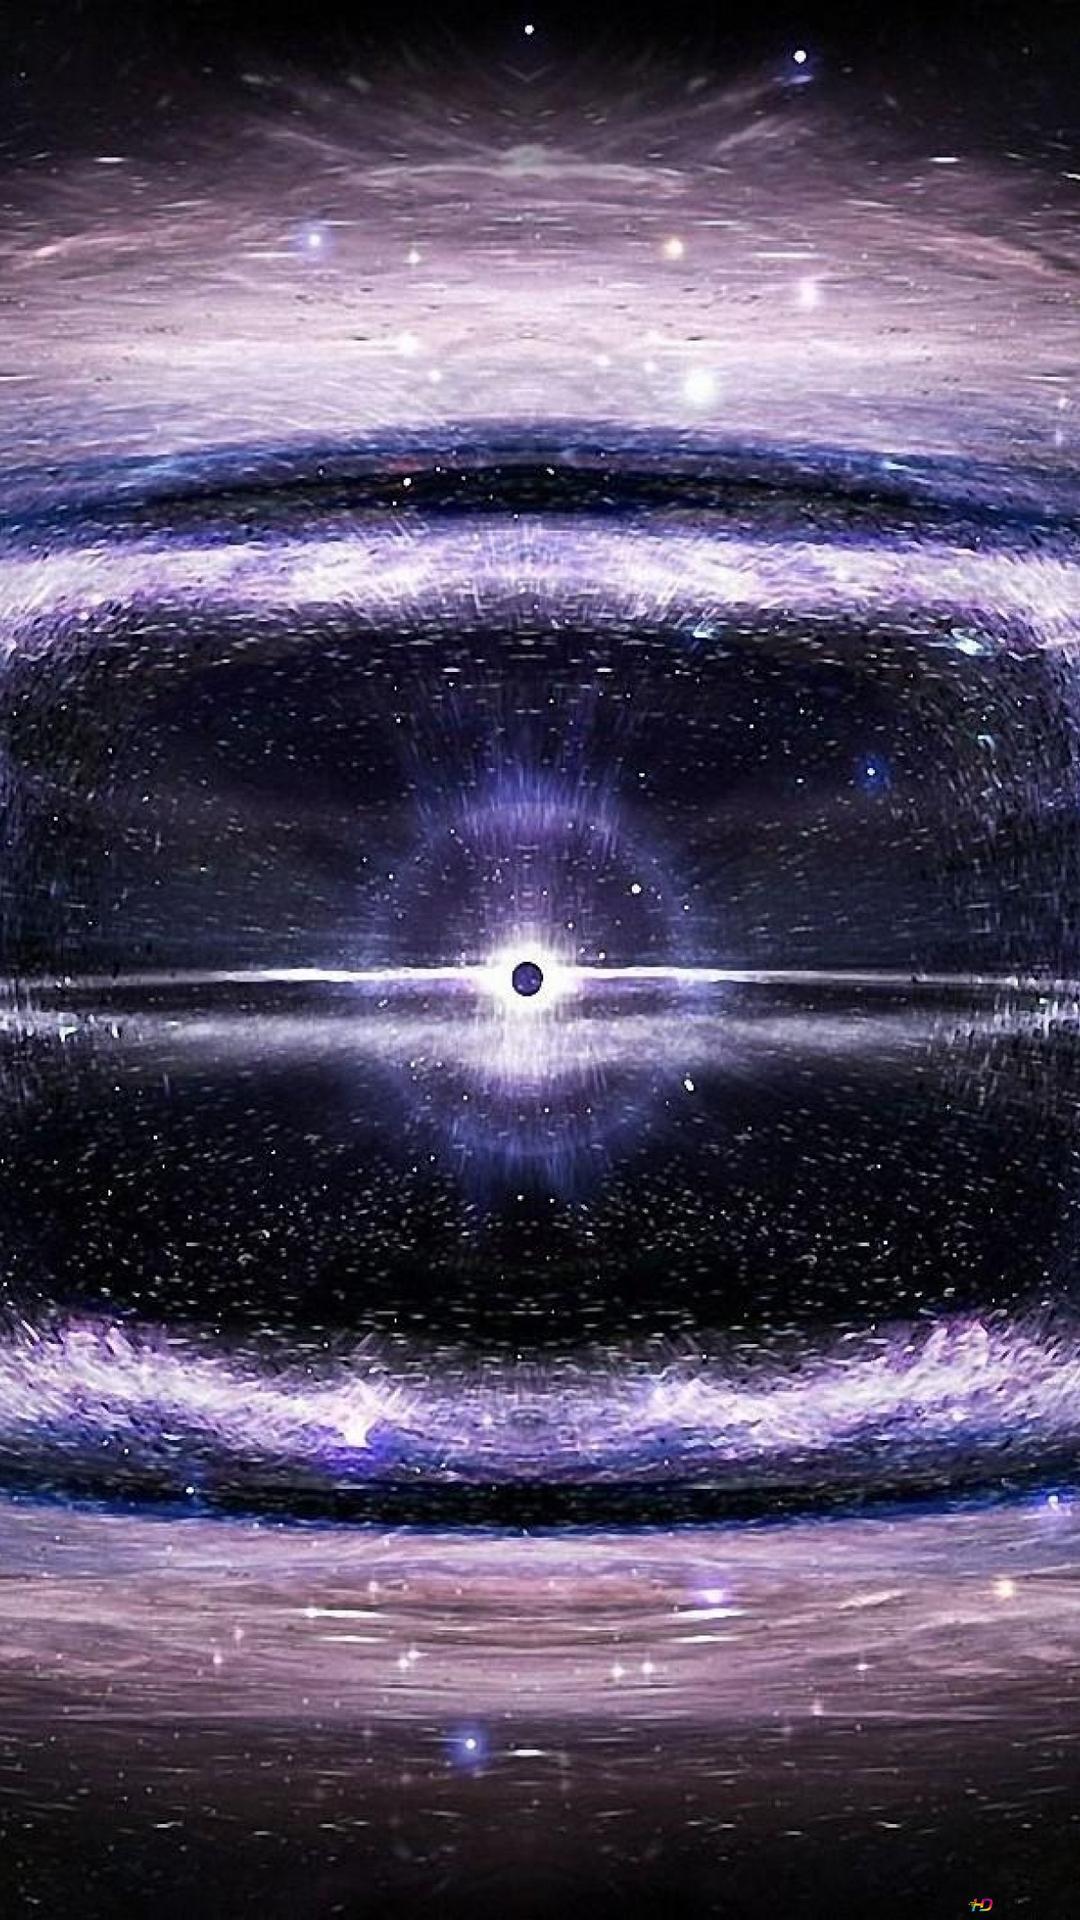 Black Hole Hd Wallpaper Download